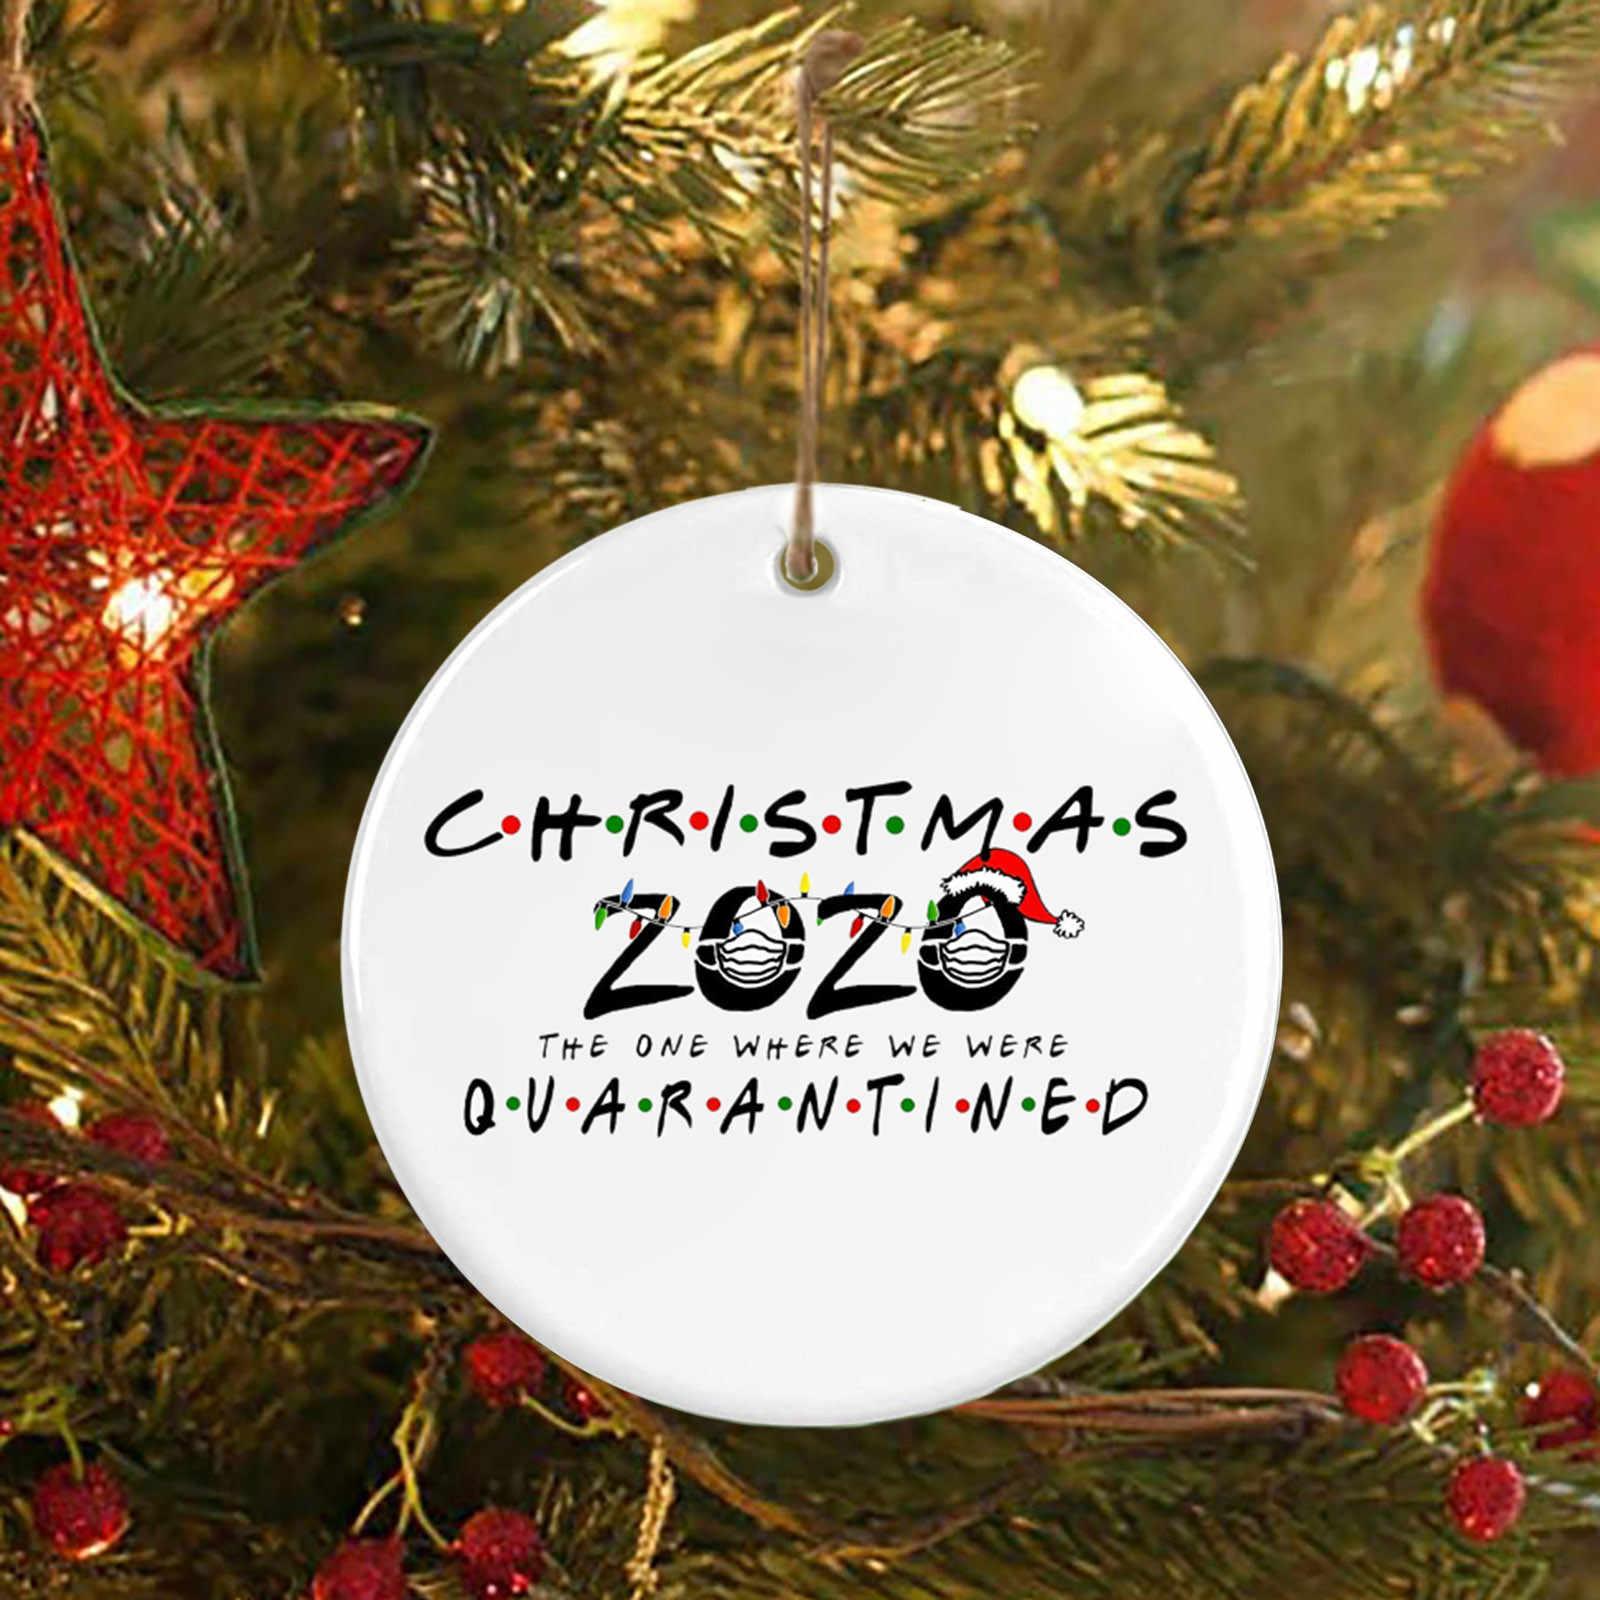 Christmas Wood Sign Ornaments Gifts 2020 Xmas Tree Door Board Hanging Decor